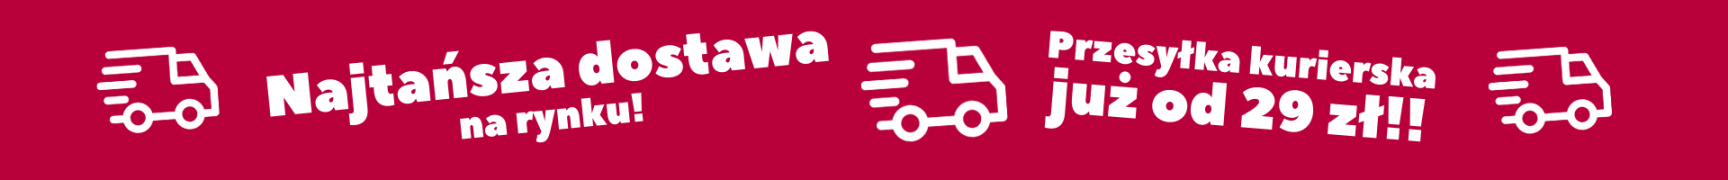 Banner reklamowy Dekorokko